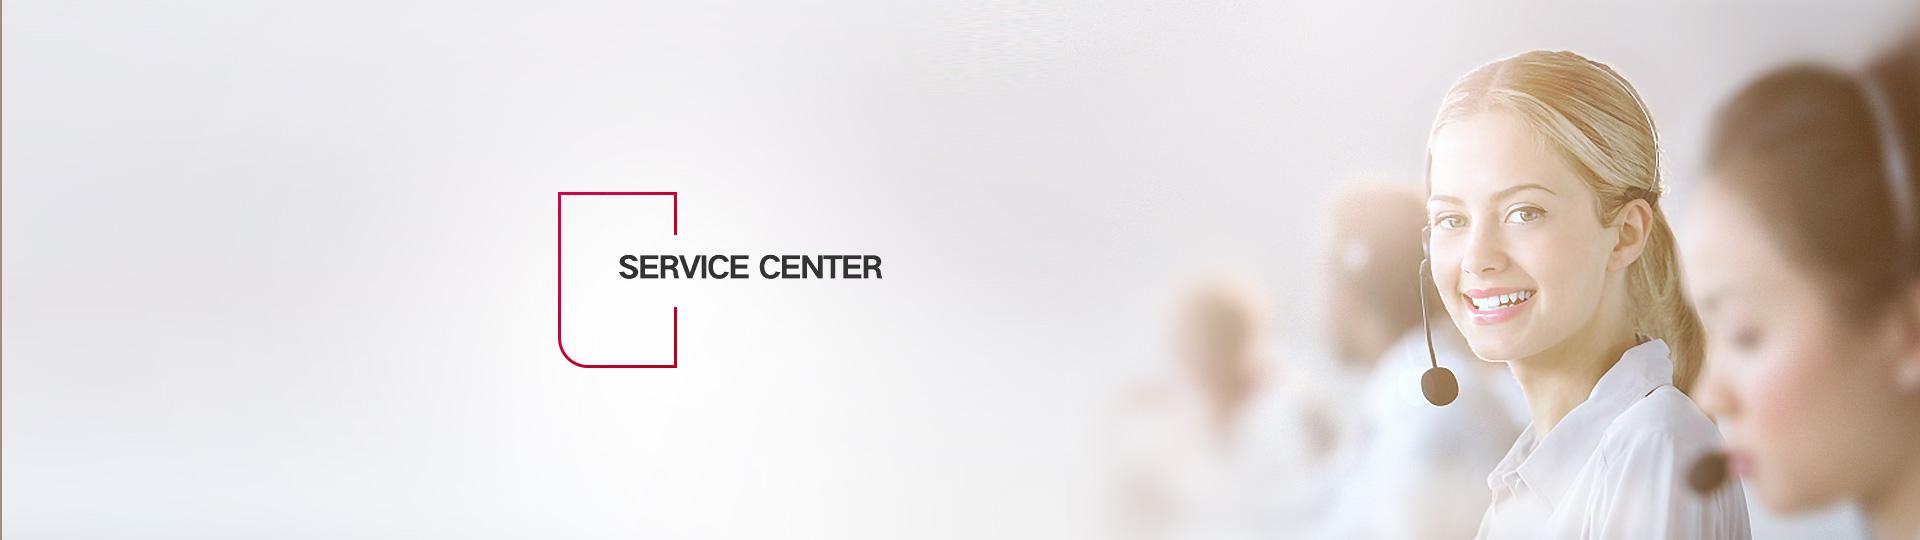 Lesso Service Center 不发布栏目